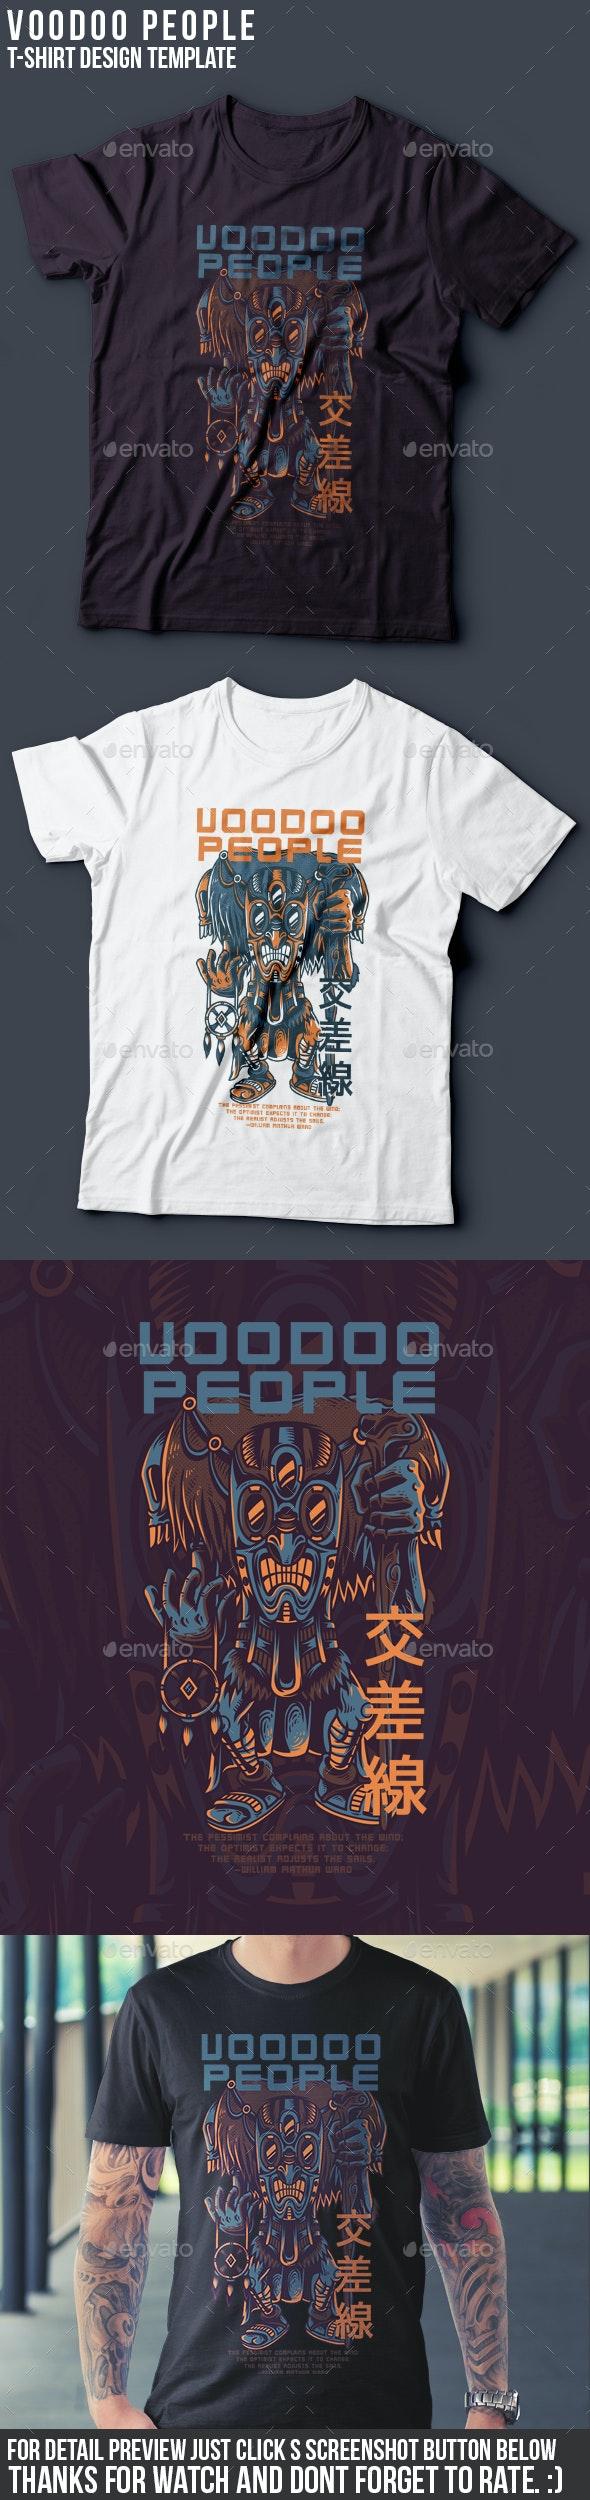 Voodoo People T-Shirt Design - Sports & Teams T-Shirts